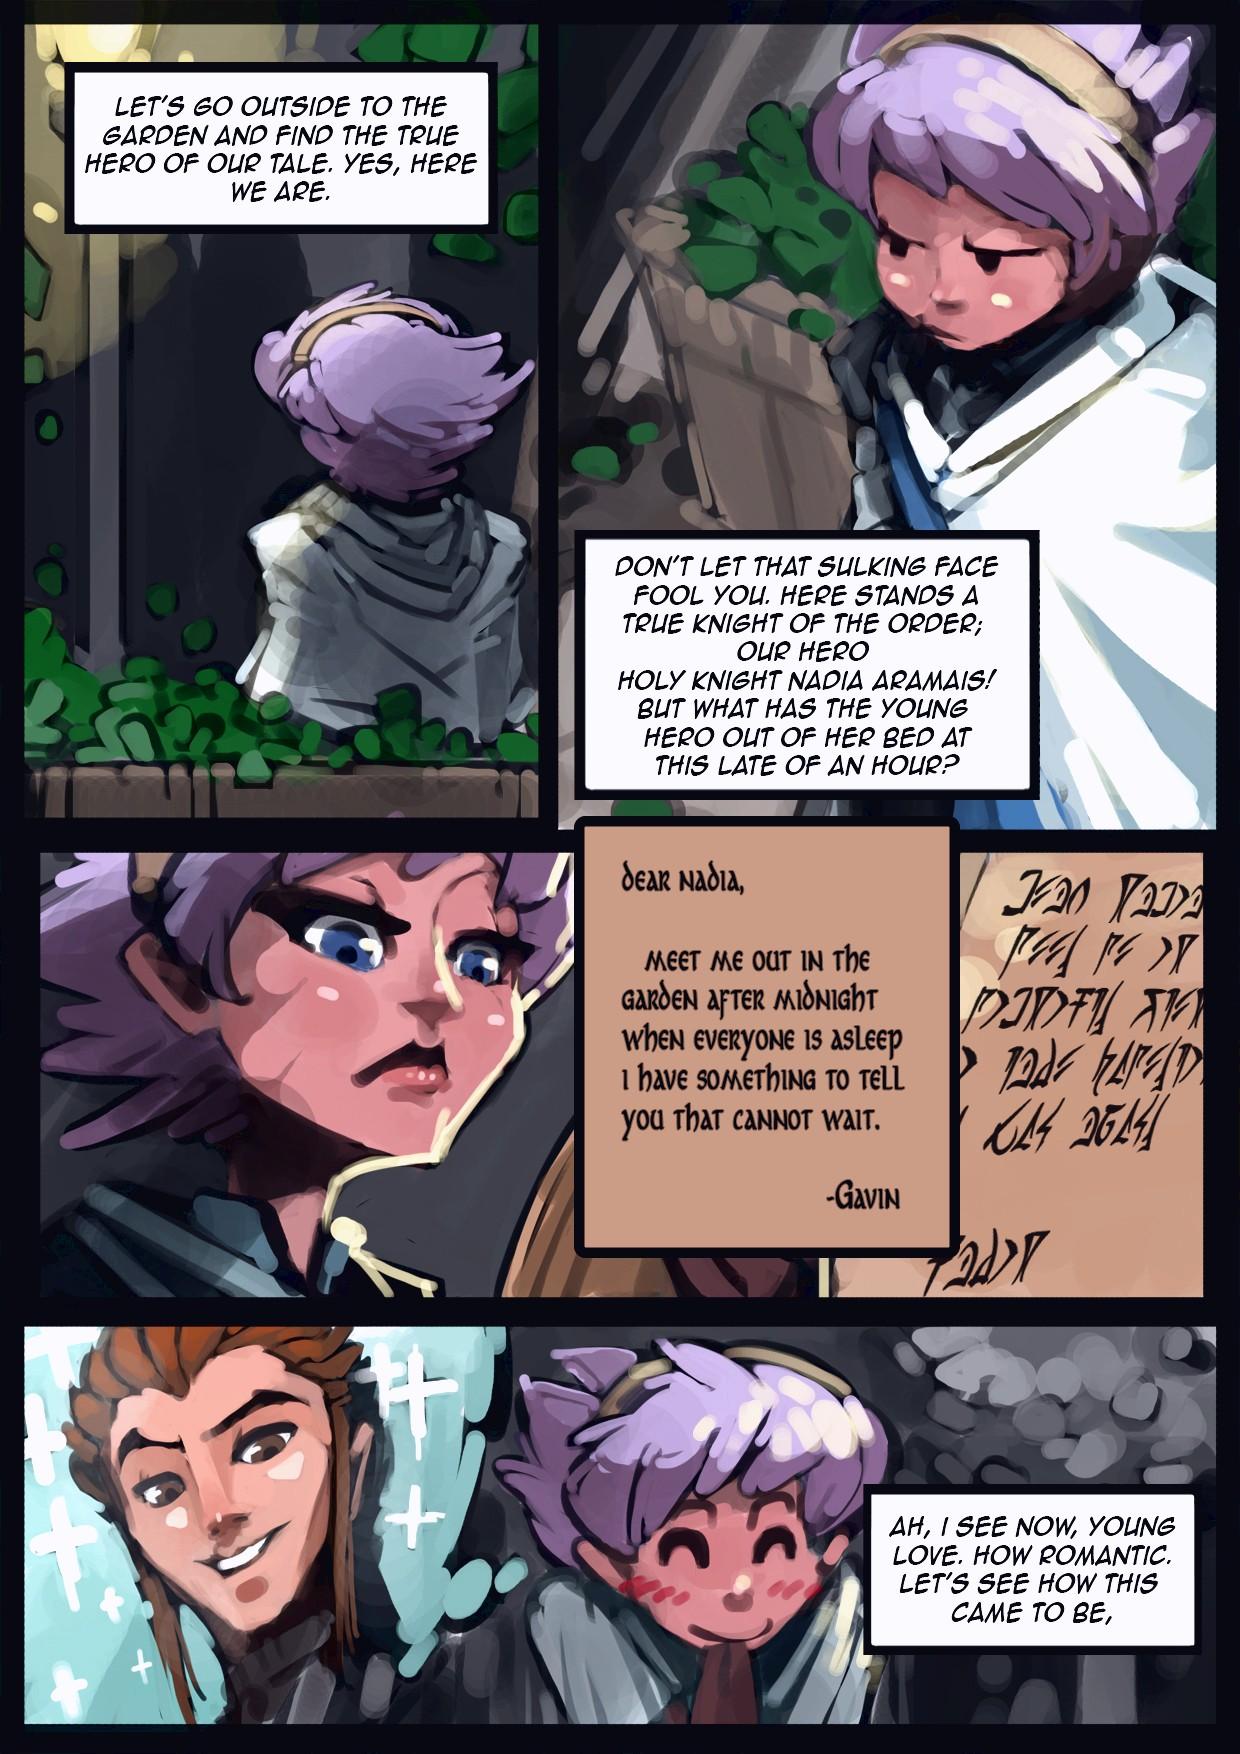 Holy Knight Nadia porn comic page 006